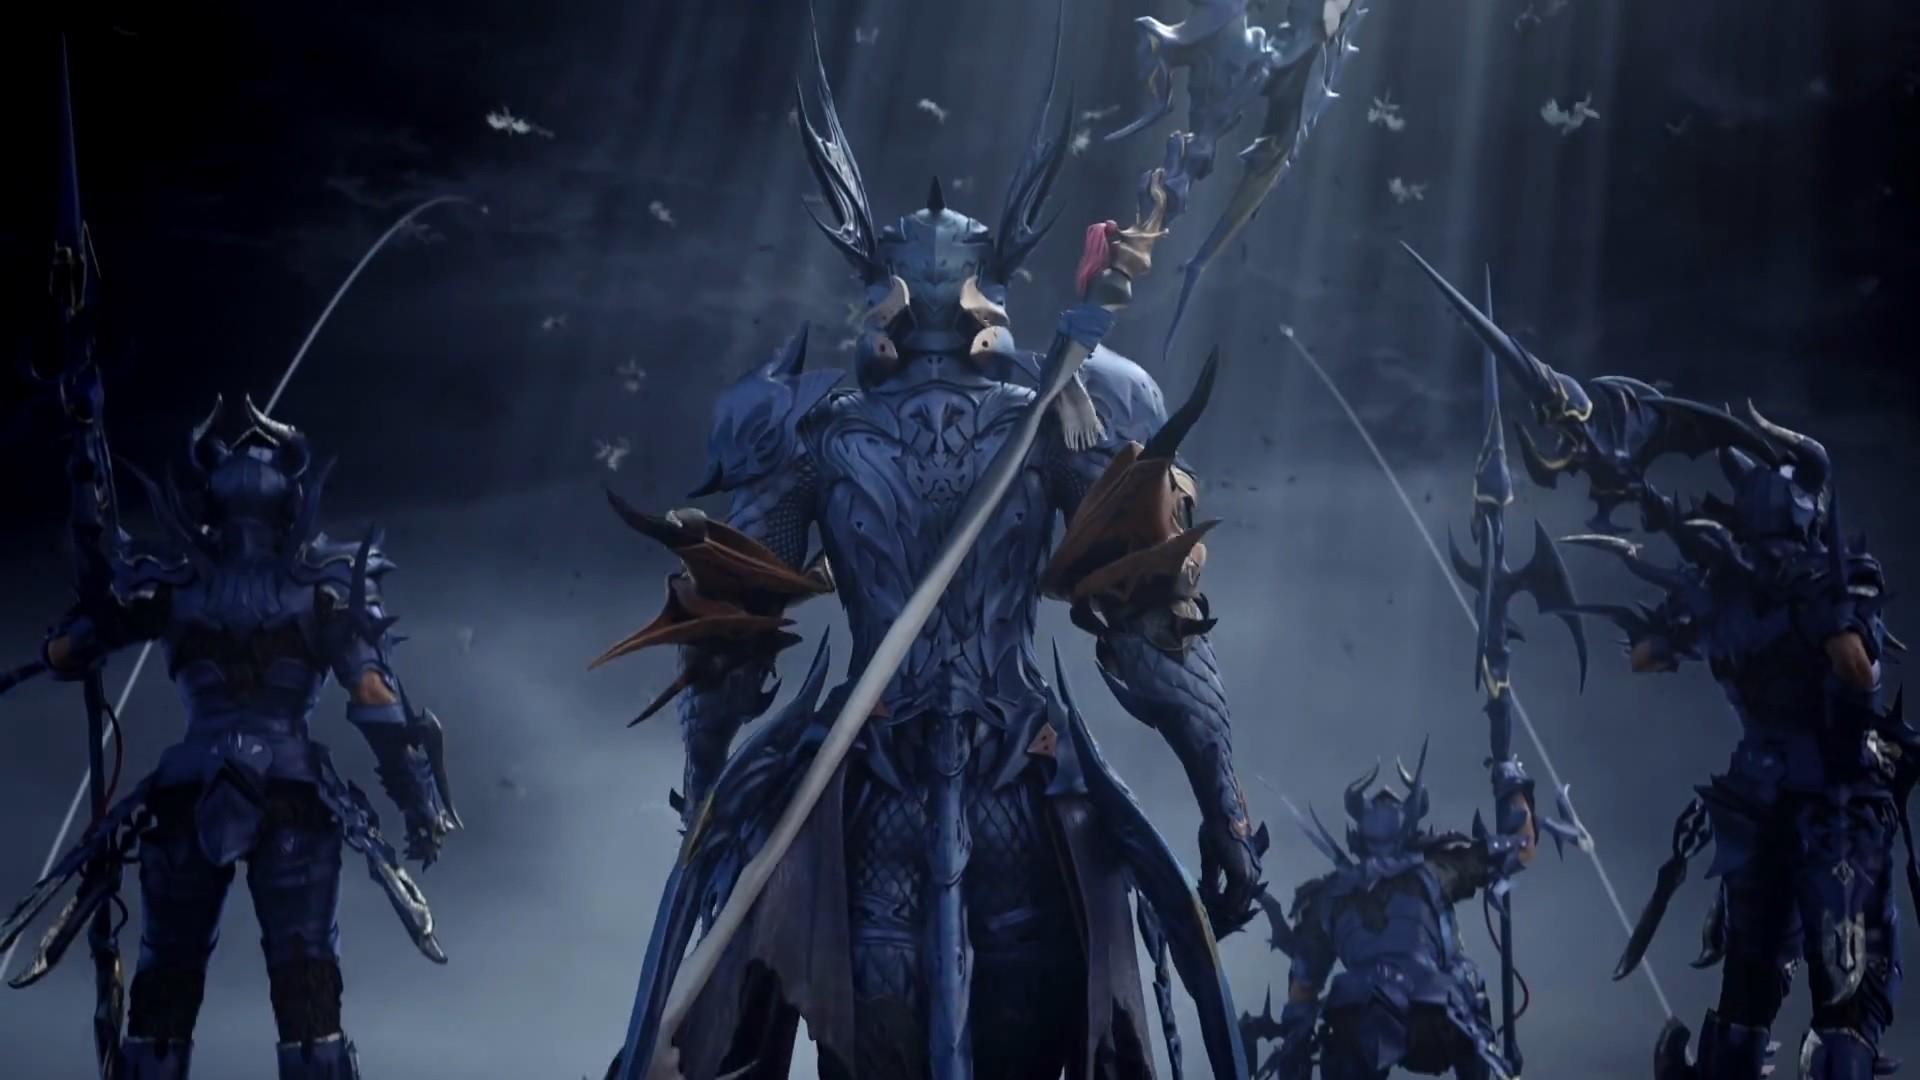 Final Fantasy XIV: Heavensward Benchmark Utility